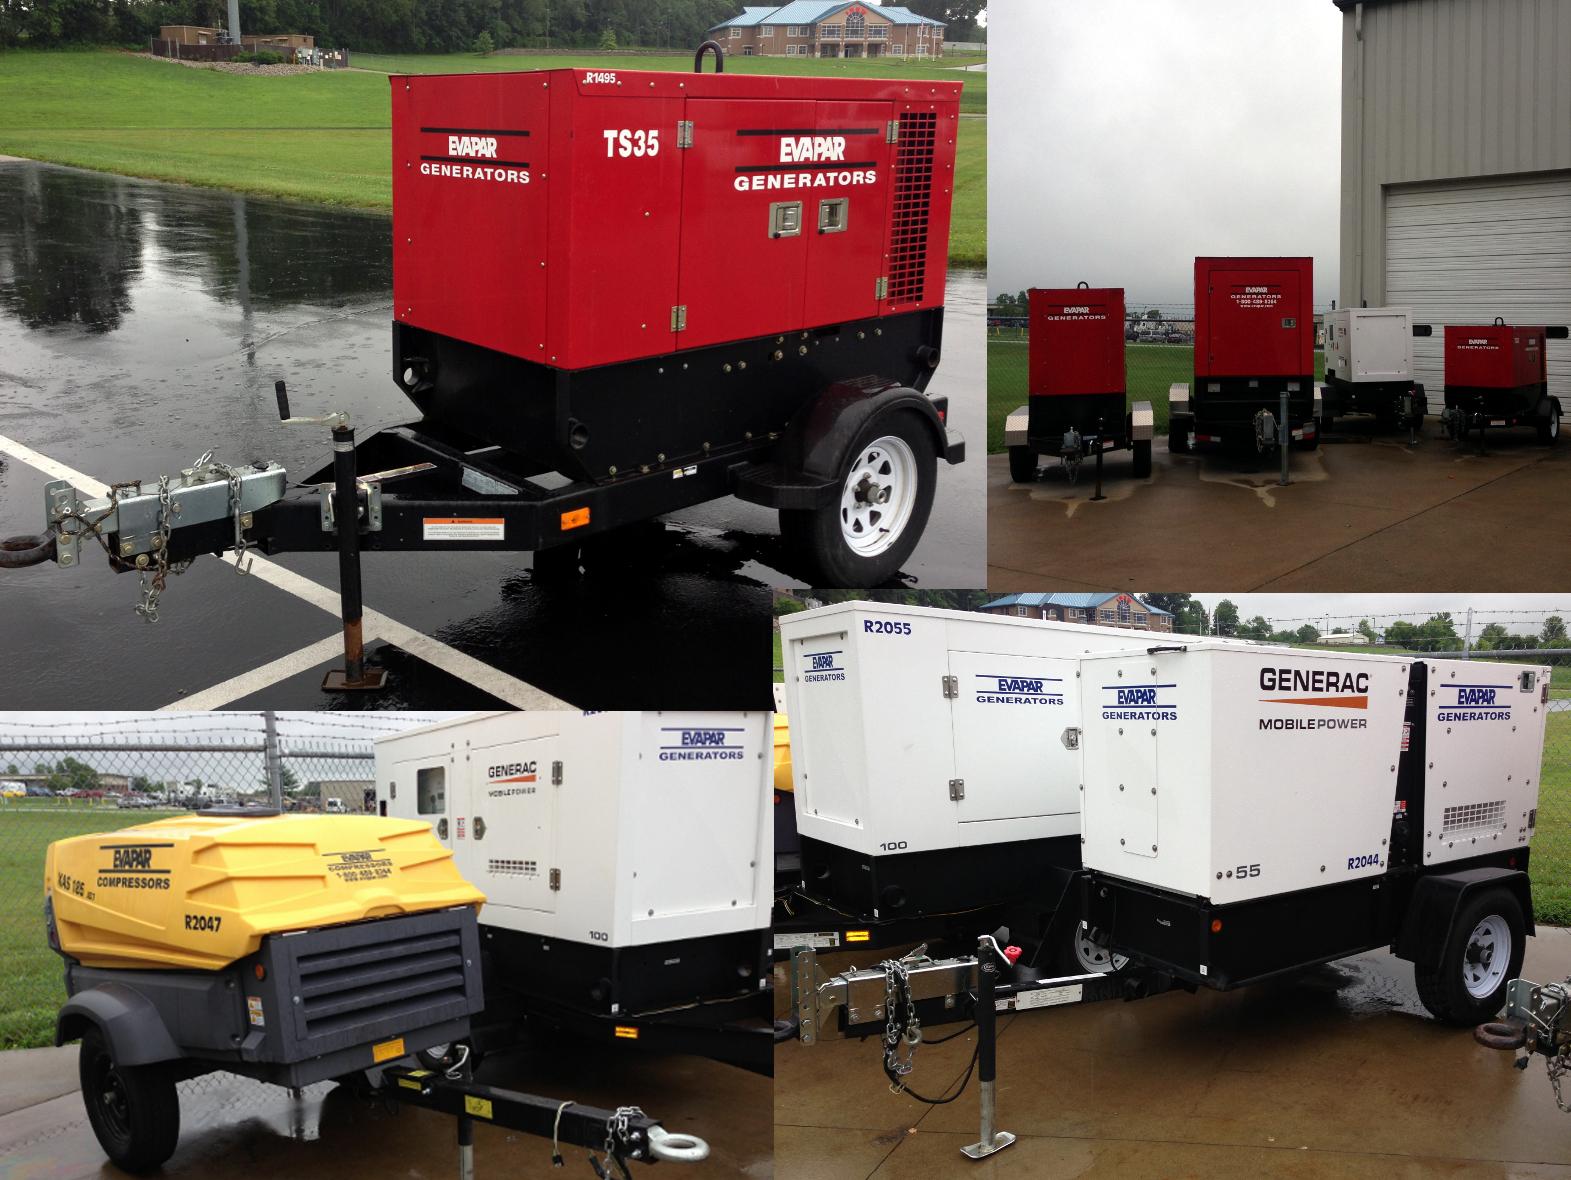 Generator Rentals Mobile Air Compressors Evapar